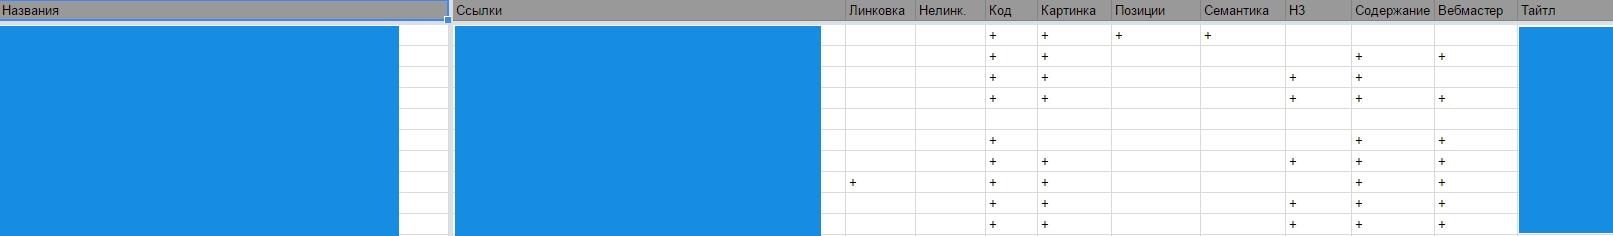 Отчет структура